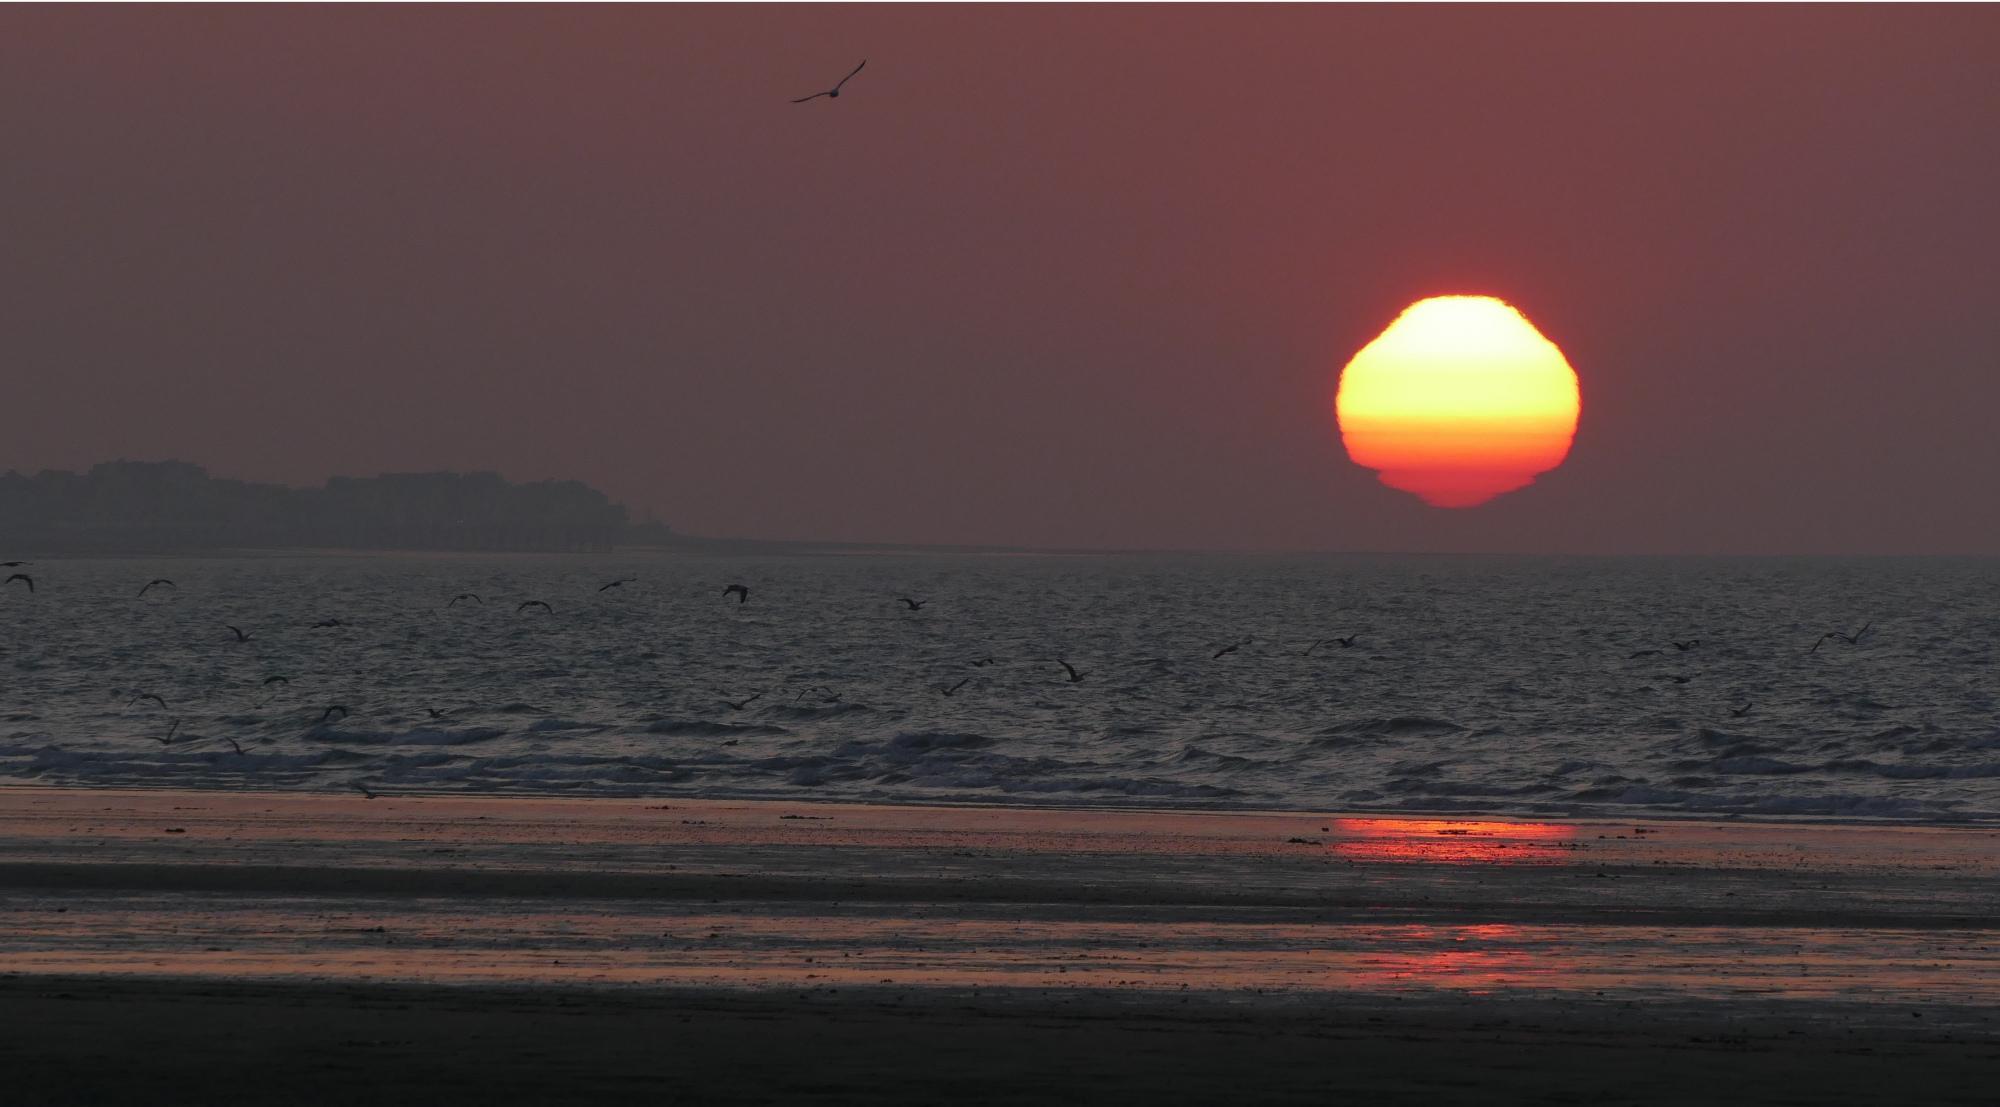 soleil1.thumb.jpg.2d34d34464d4fbbe0d2b9b29926e4b75.jpg